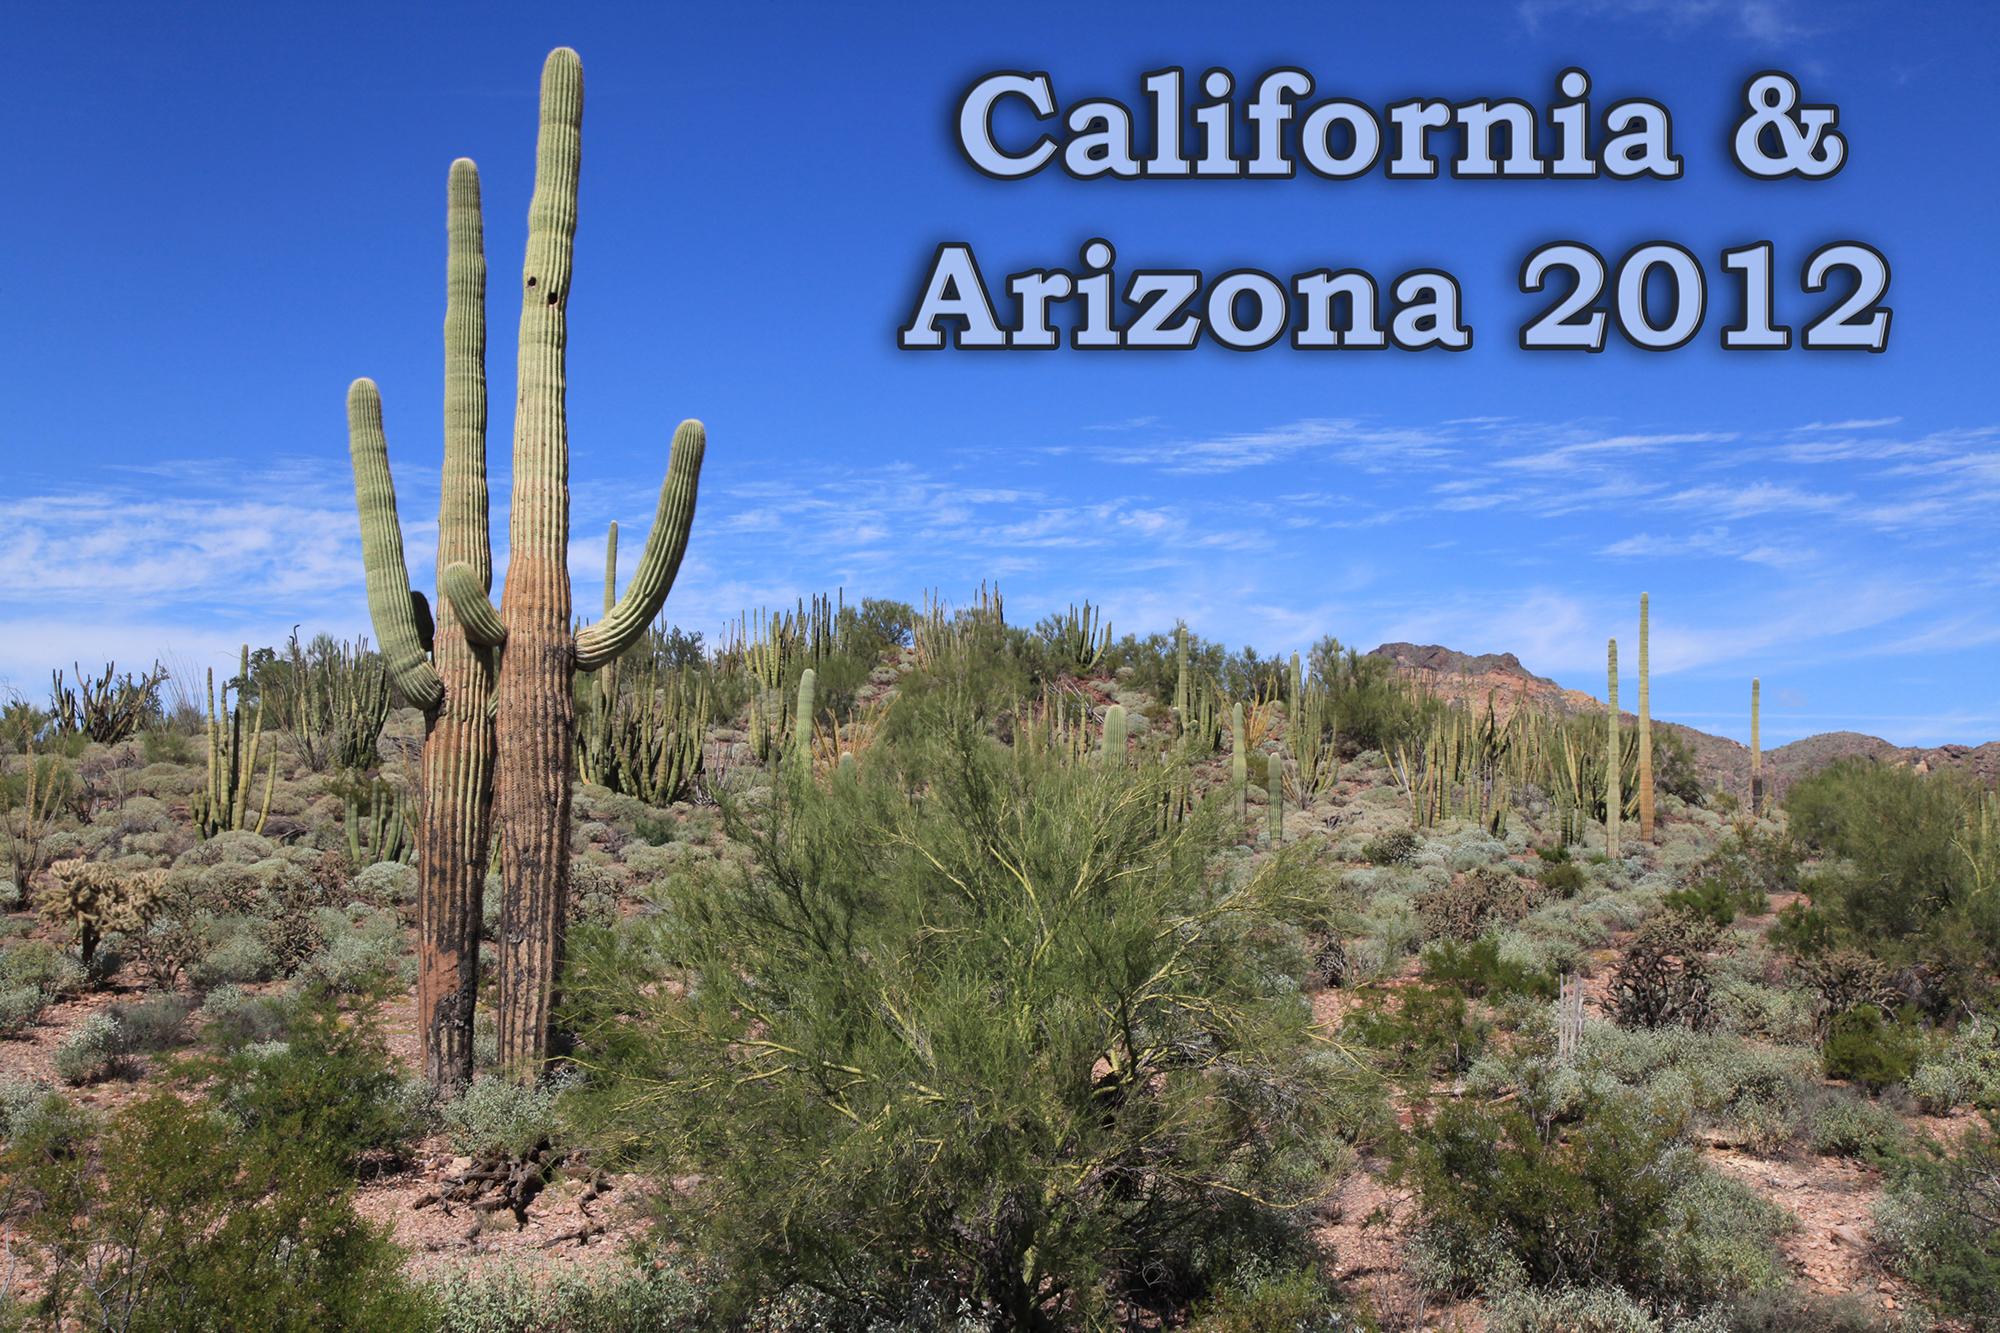 California Arizona 2012